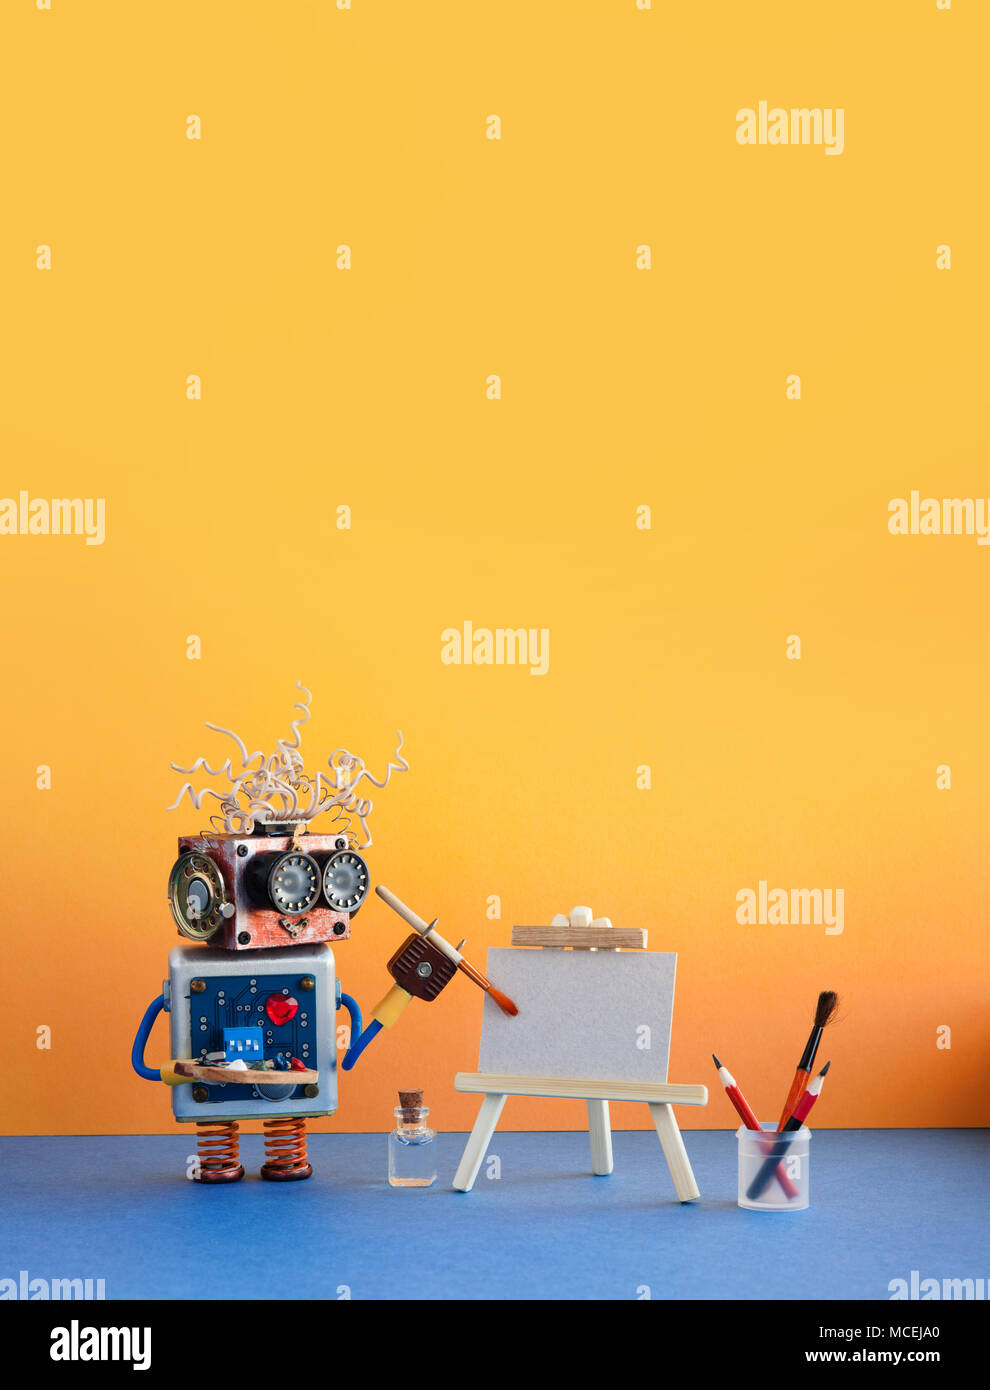 Poster Template Stockfotos & Poster Template Bilder - Alamy